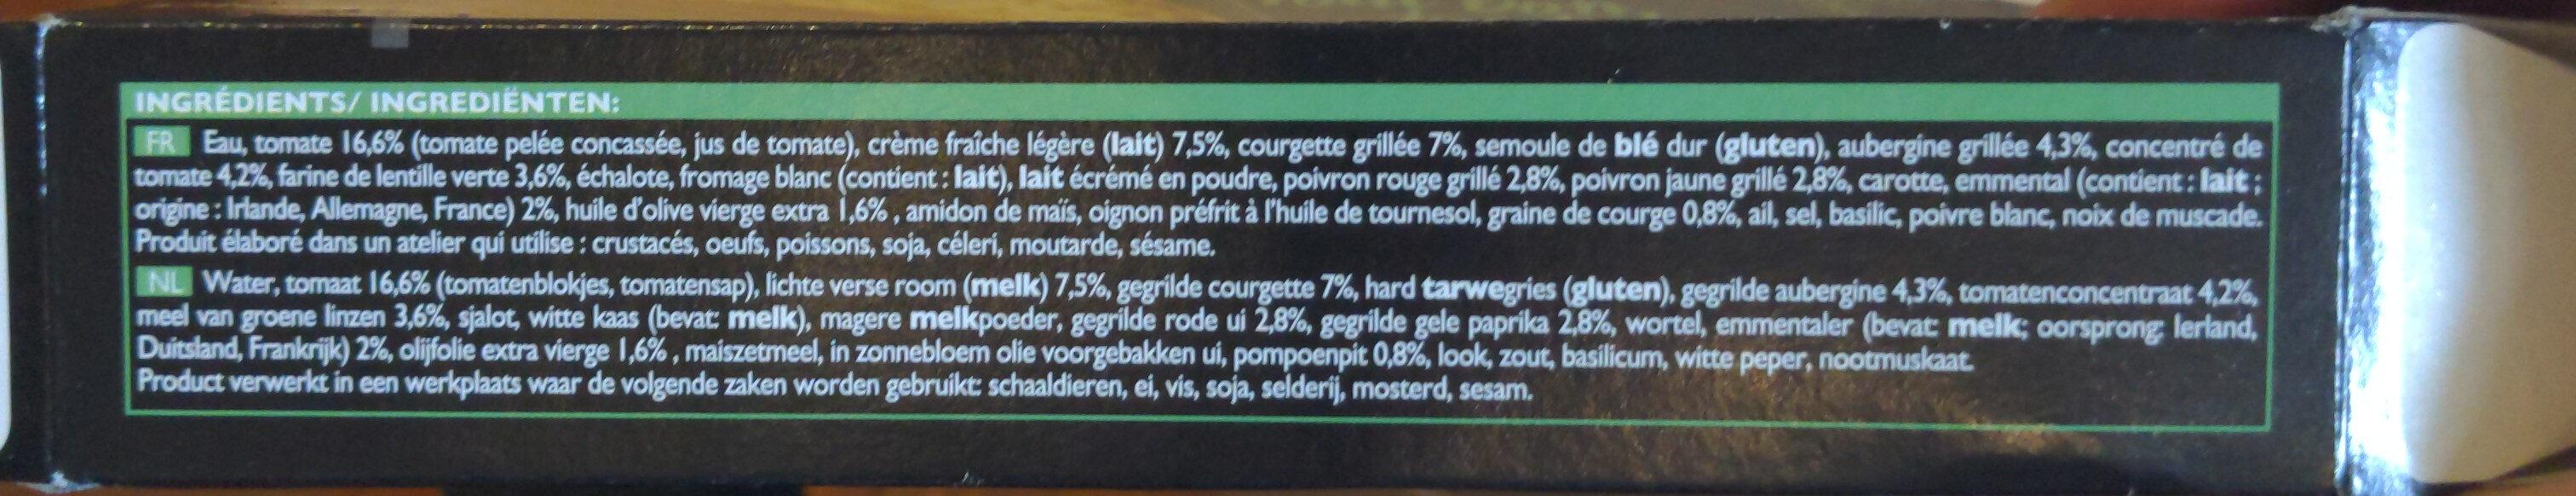 Lasagnes aux légumes - Ingrediënten - fr